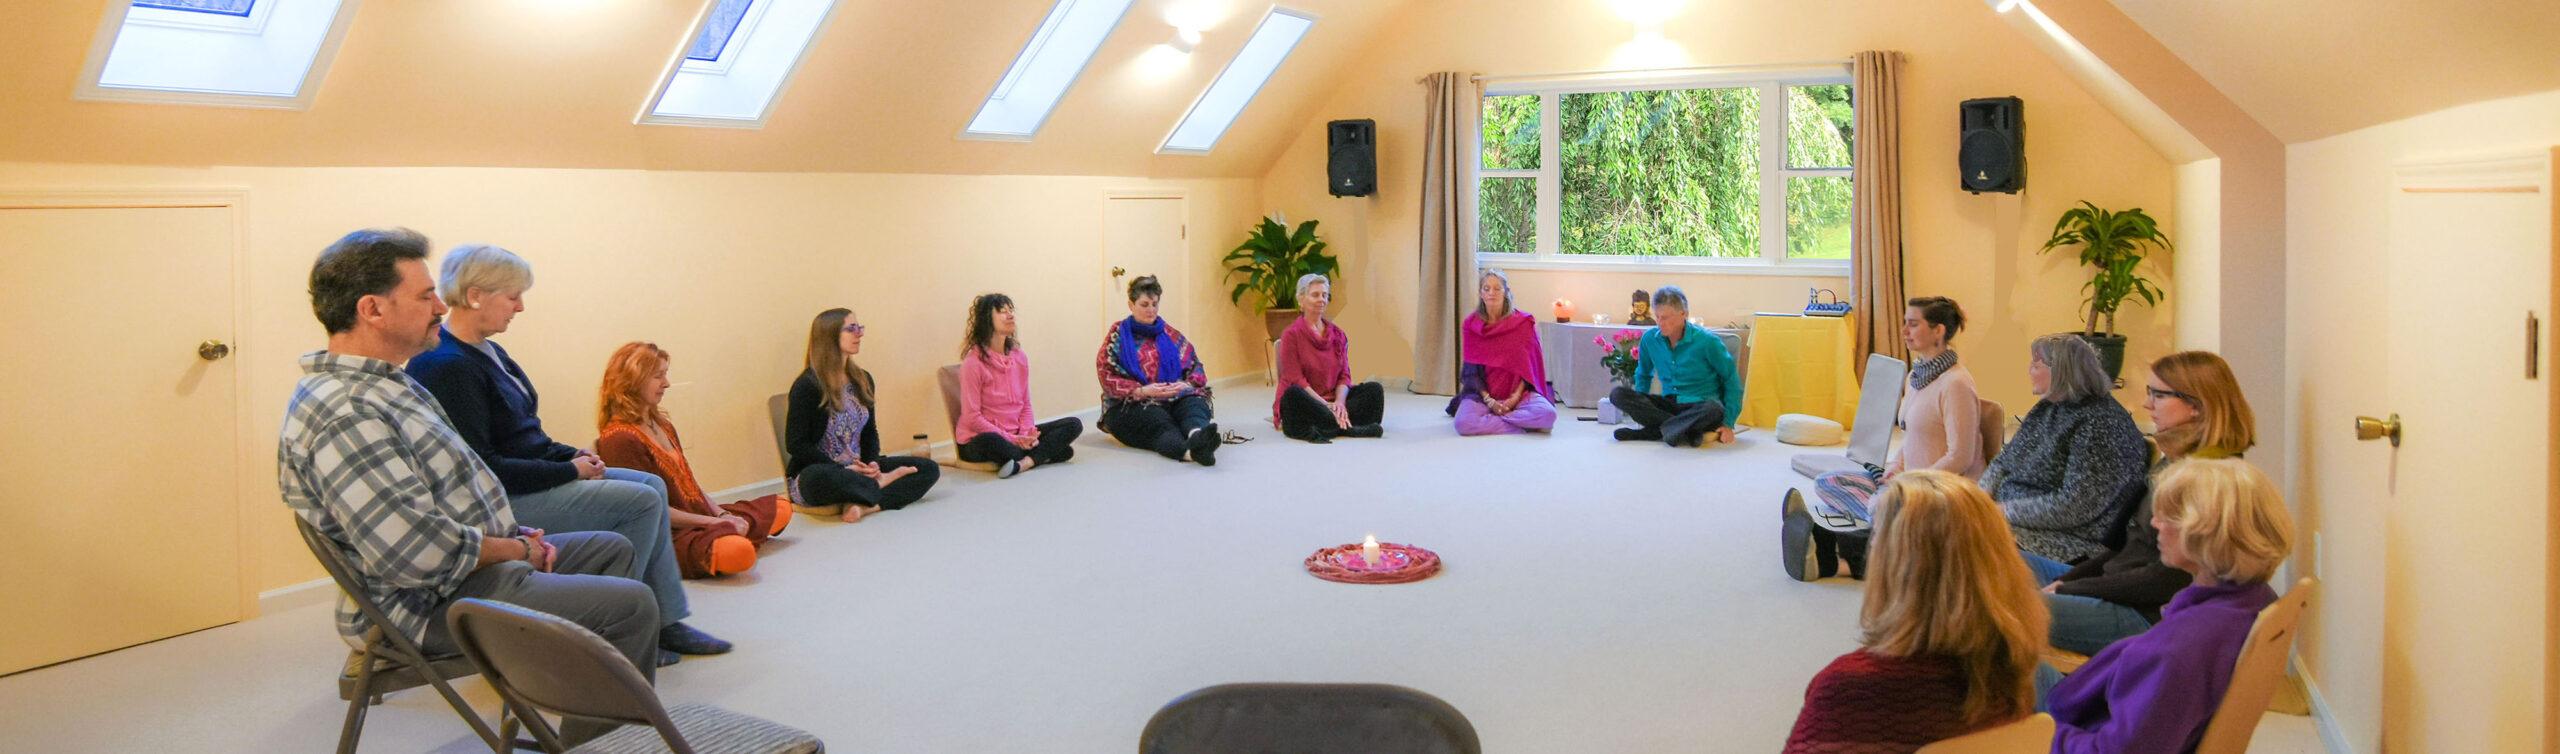 Meditation Retreats in Asheville